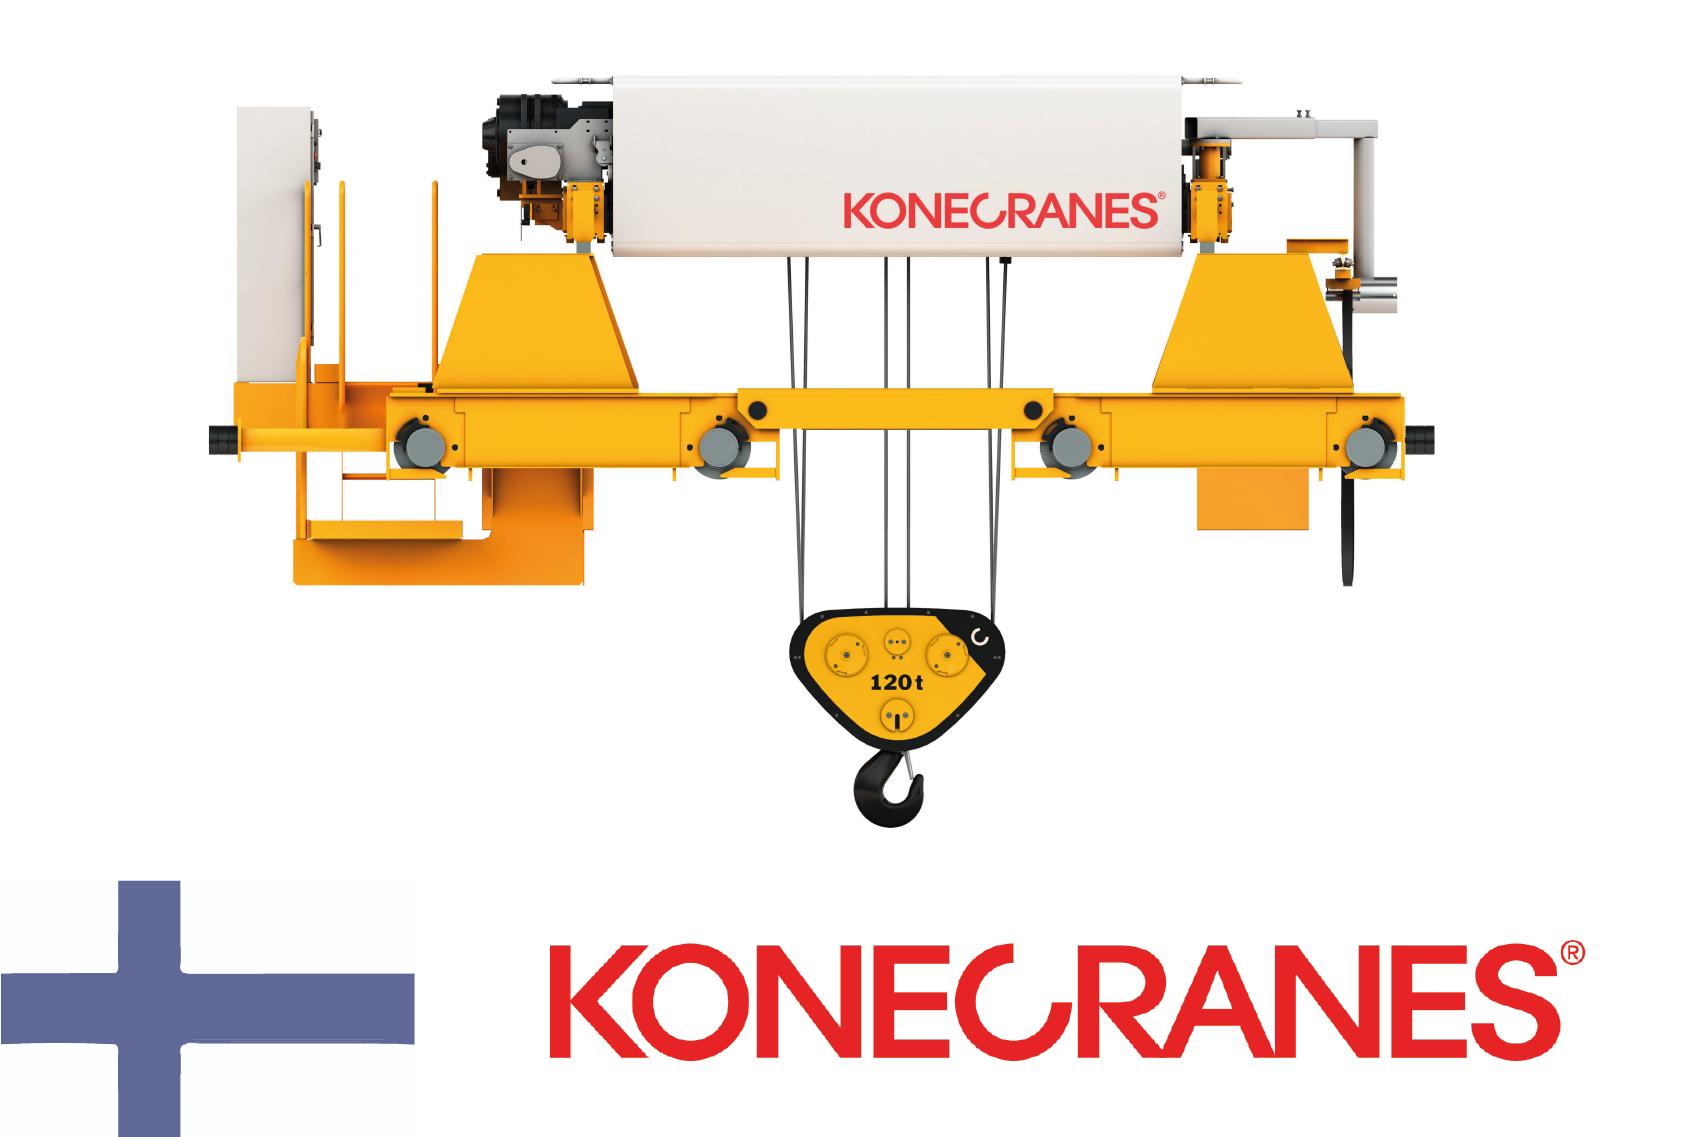 #16 Konecranes - Longer life and better service - CIRCit Nord